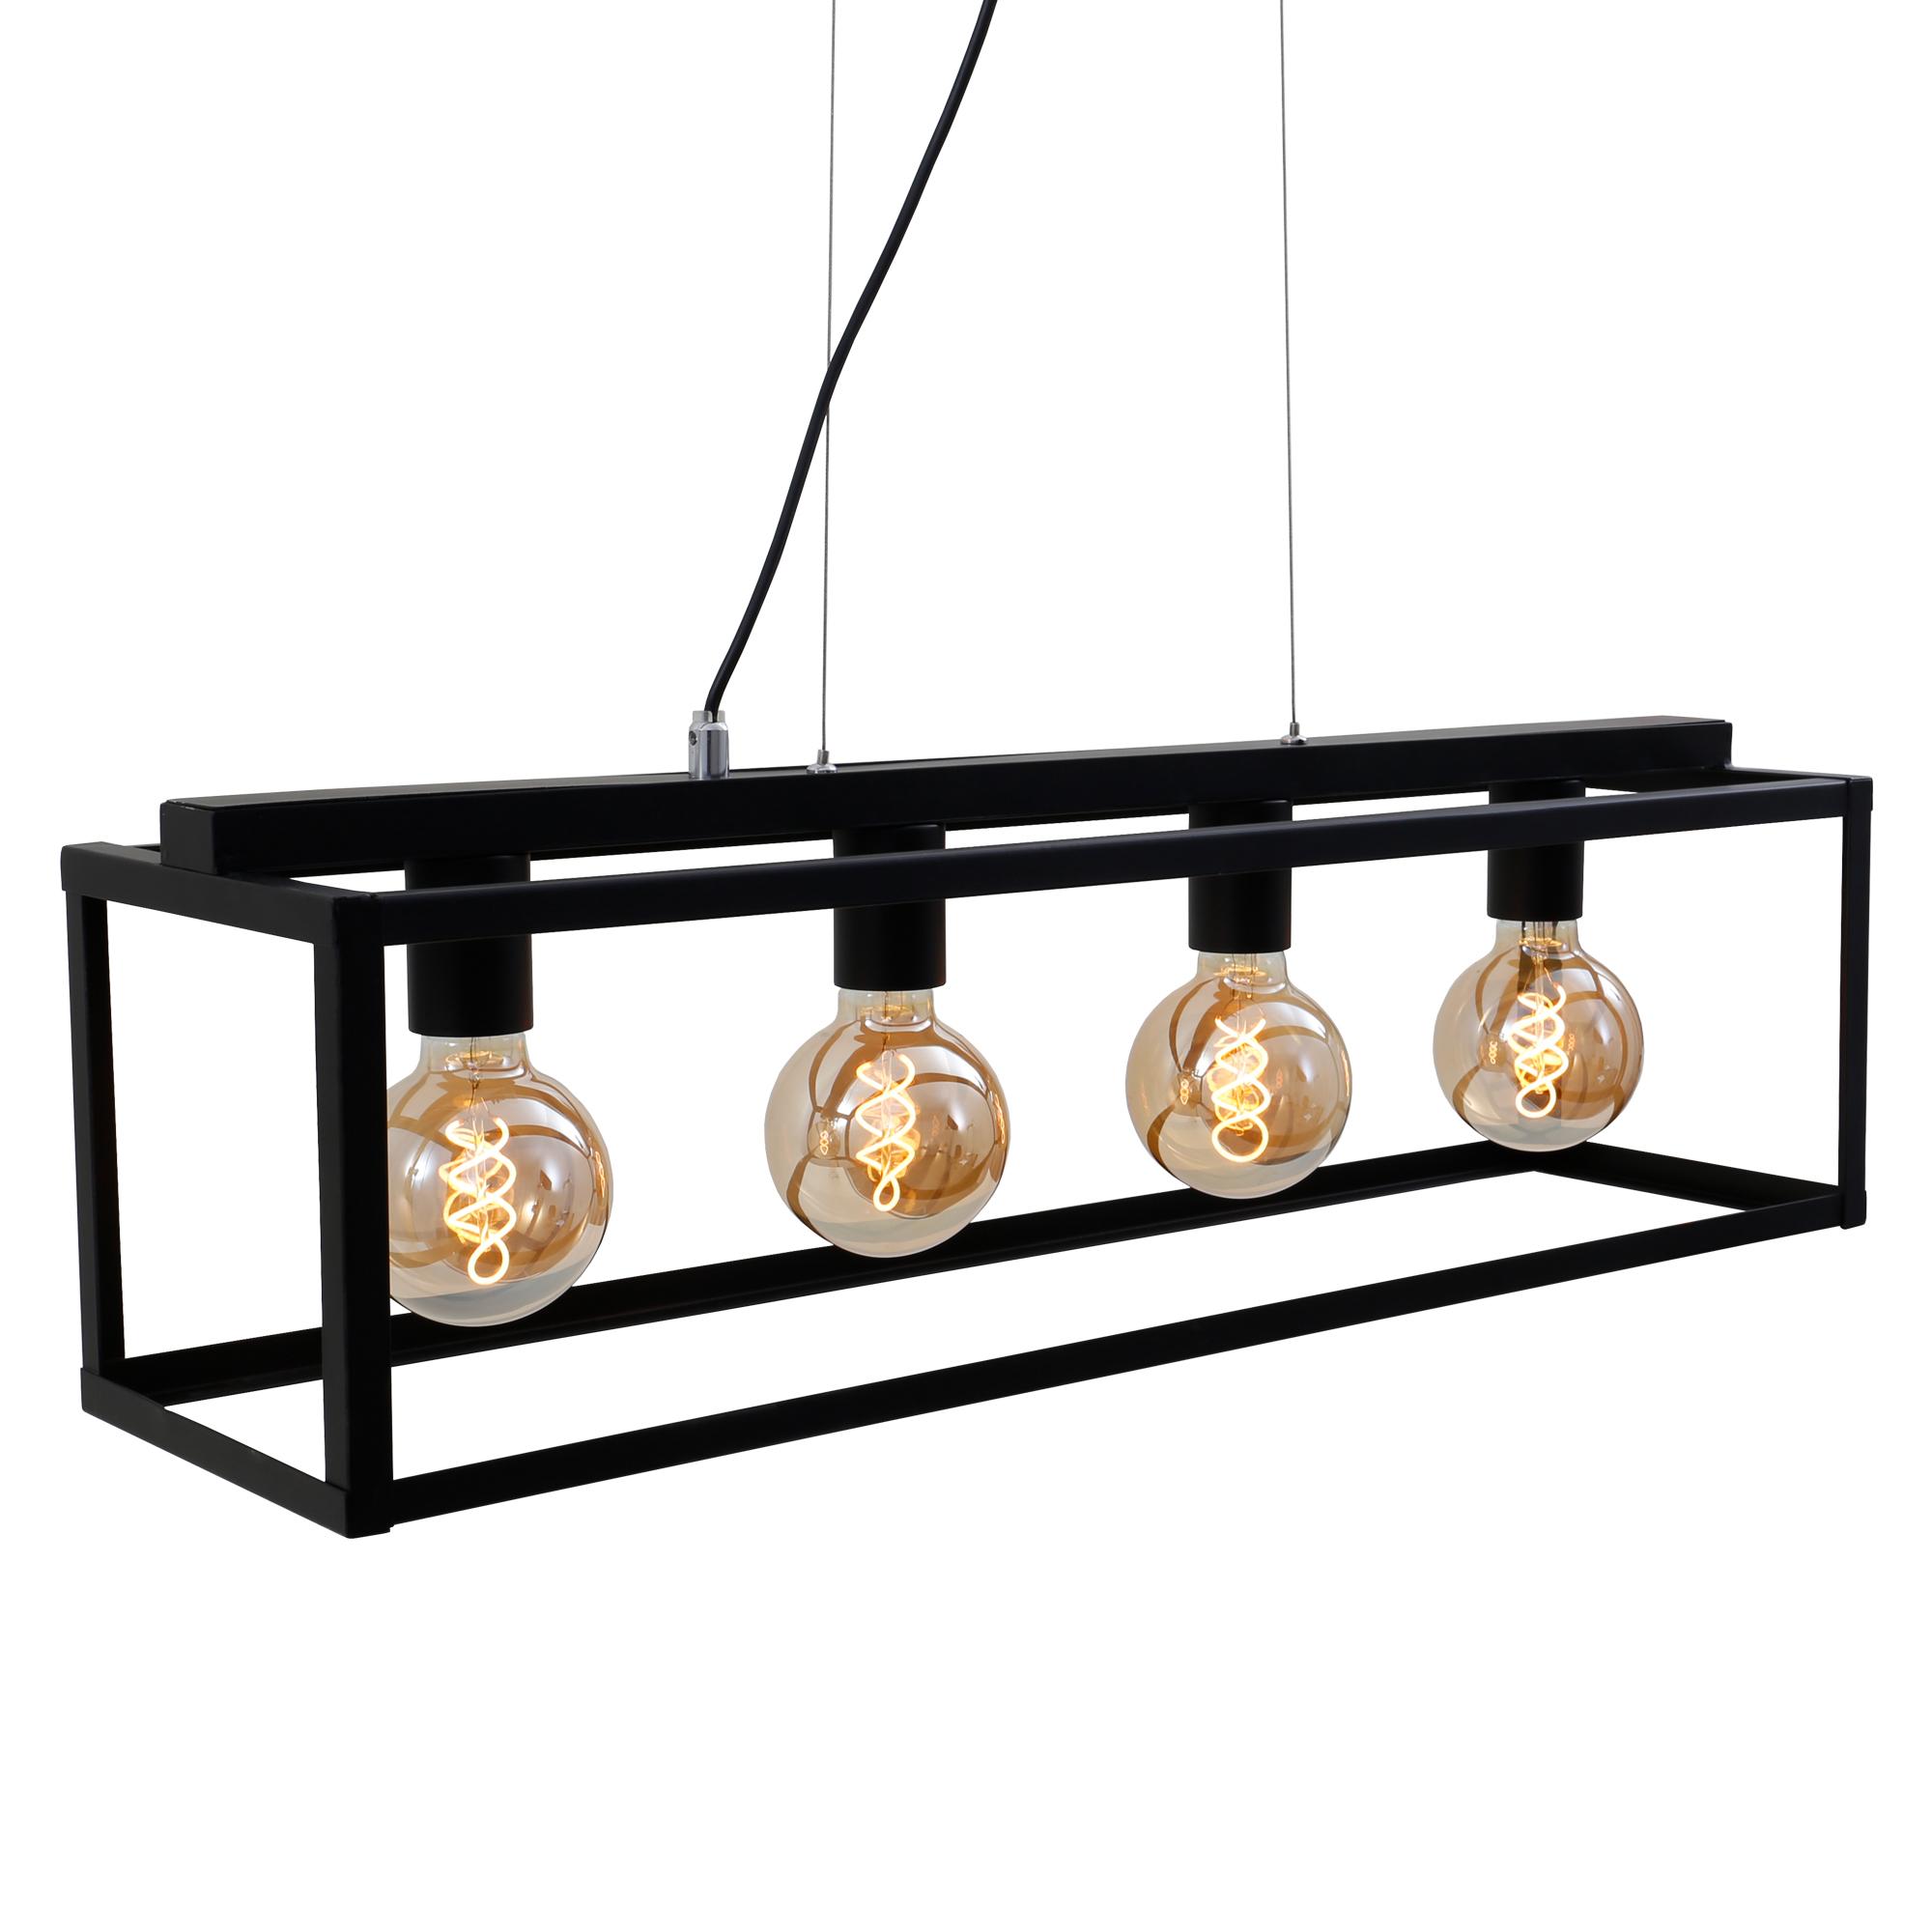 LED Pendelleuchte, 75 cm, max. 40 W, Schwarz